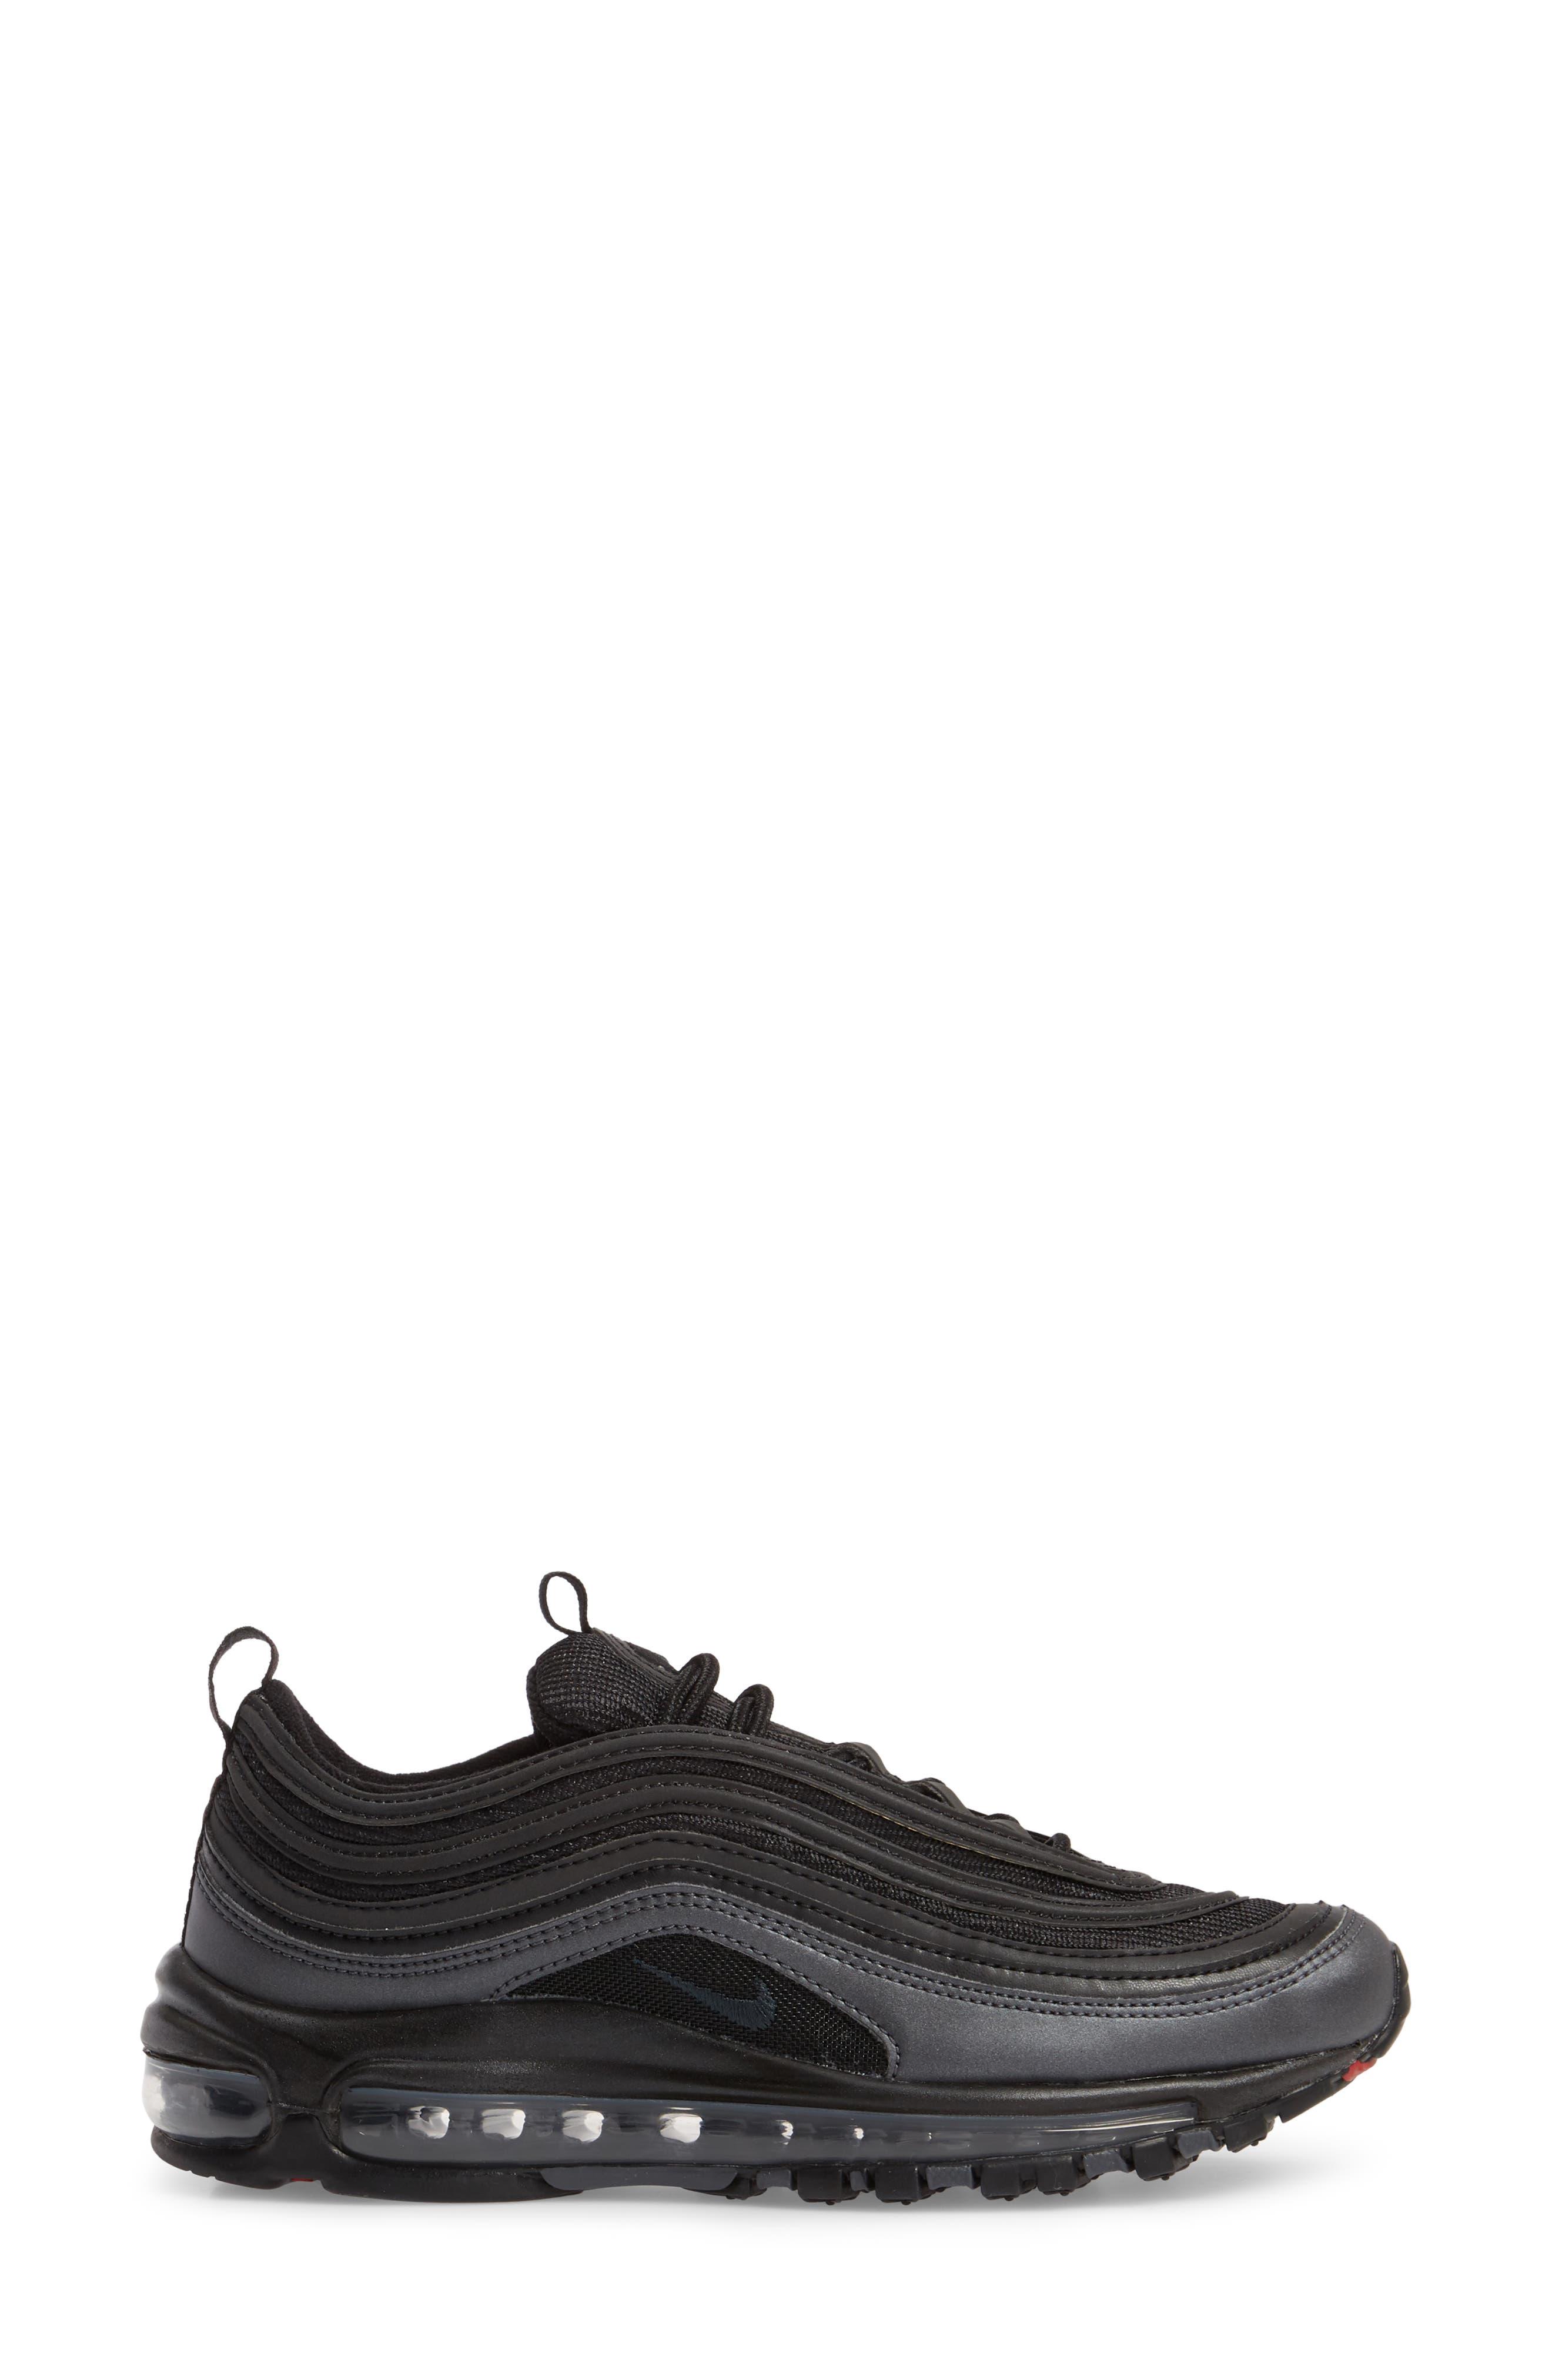 Air Max 97 Sneaker,                             Alternate thumbnail 3, color,                             Black/ Anthracite/ Hematite